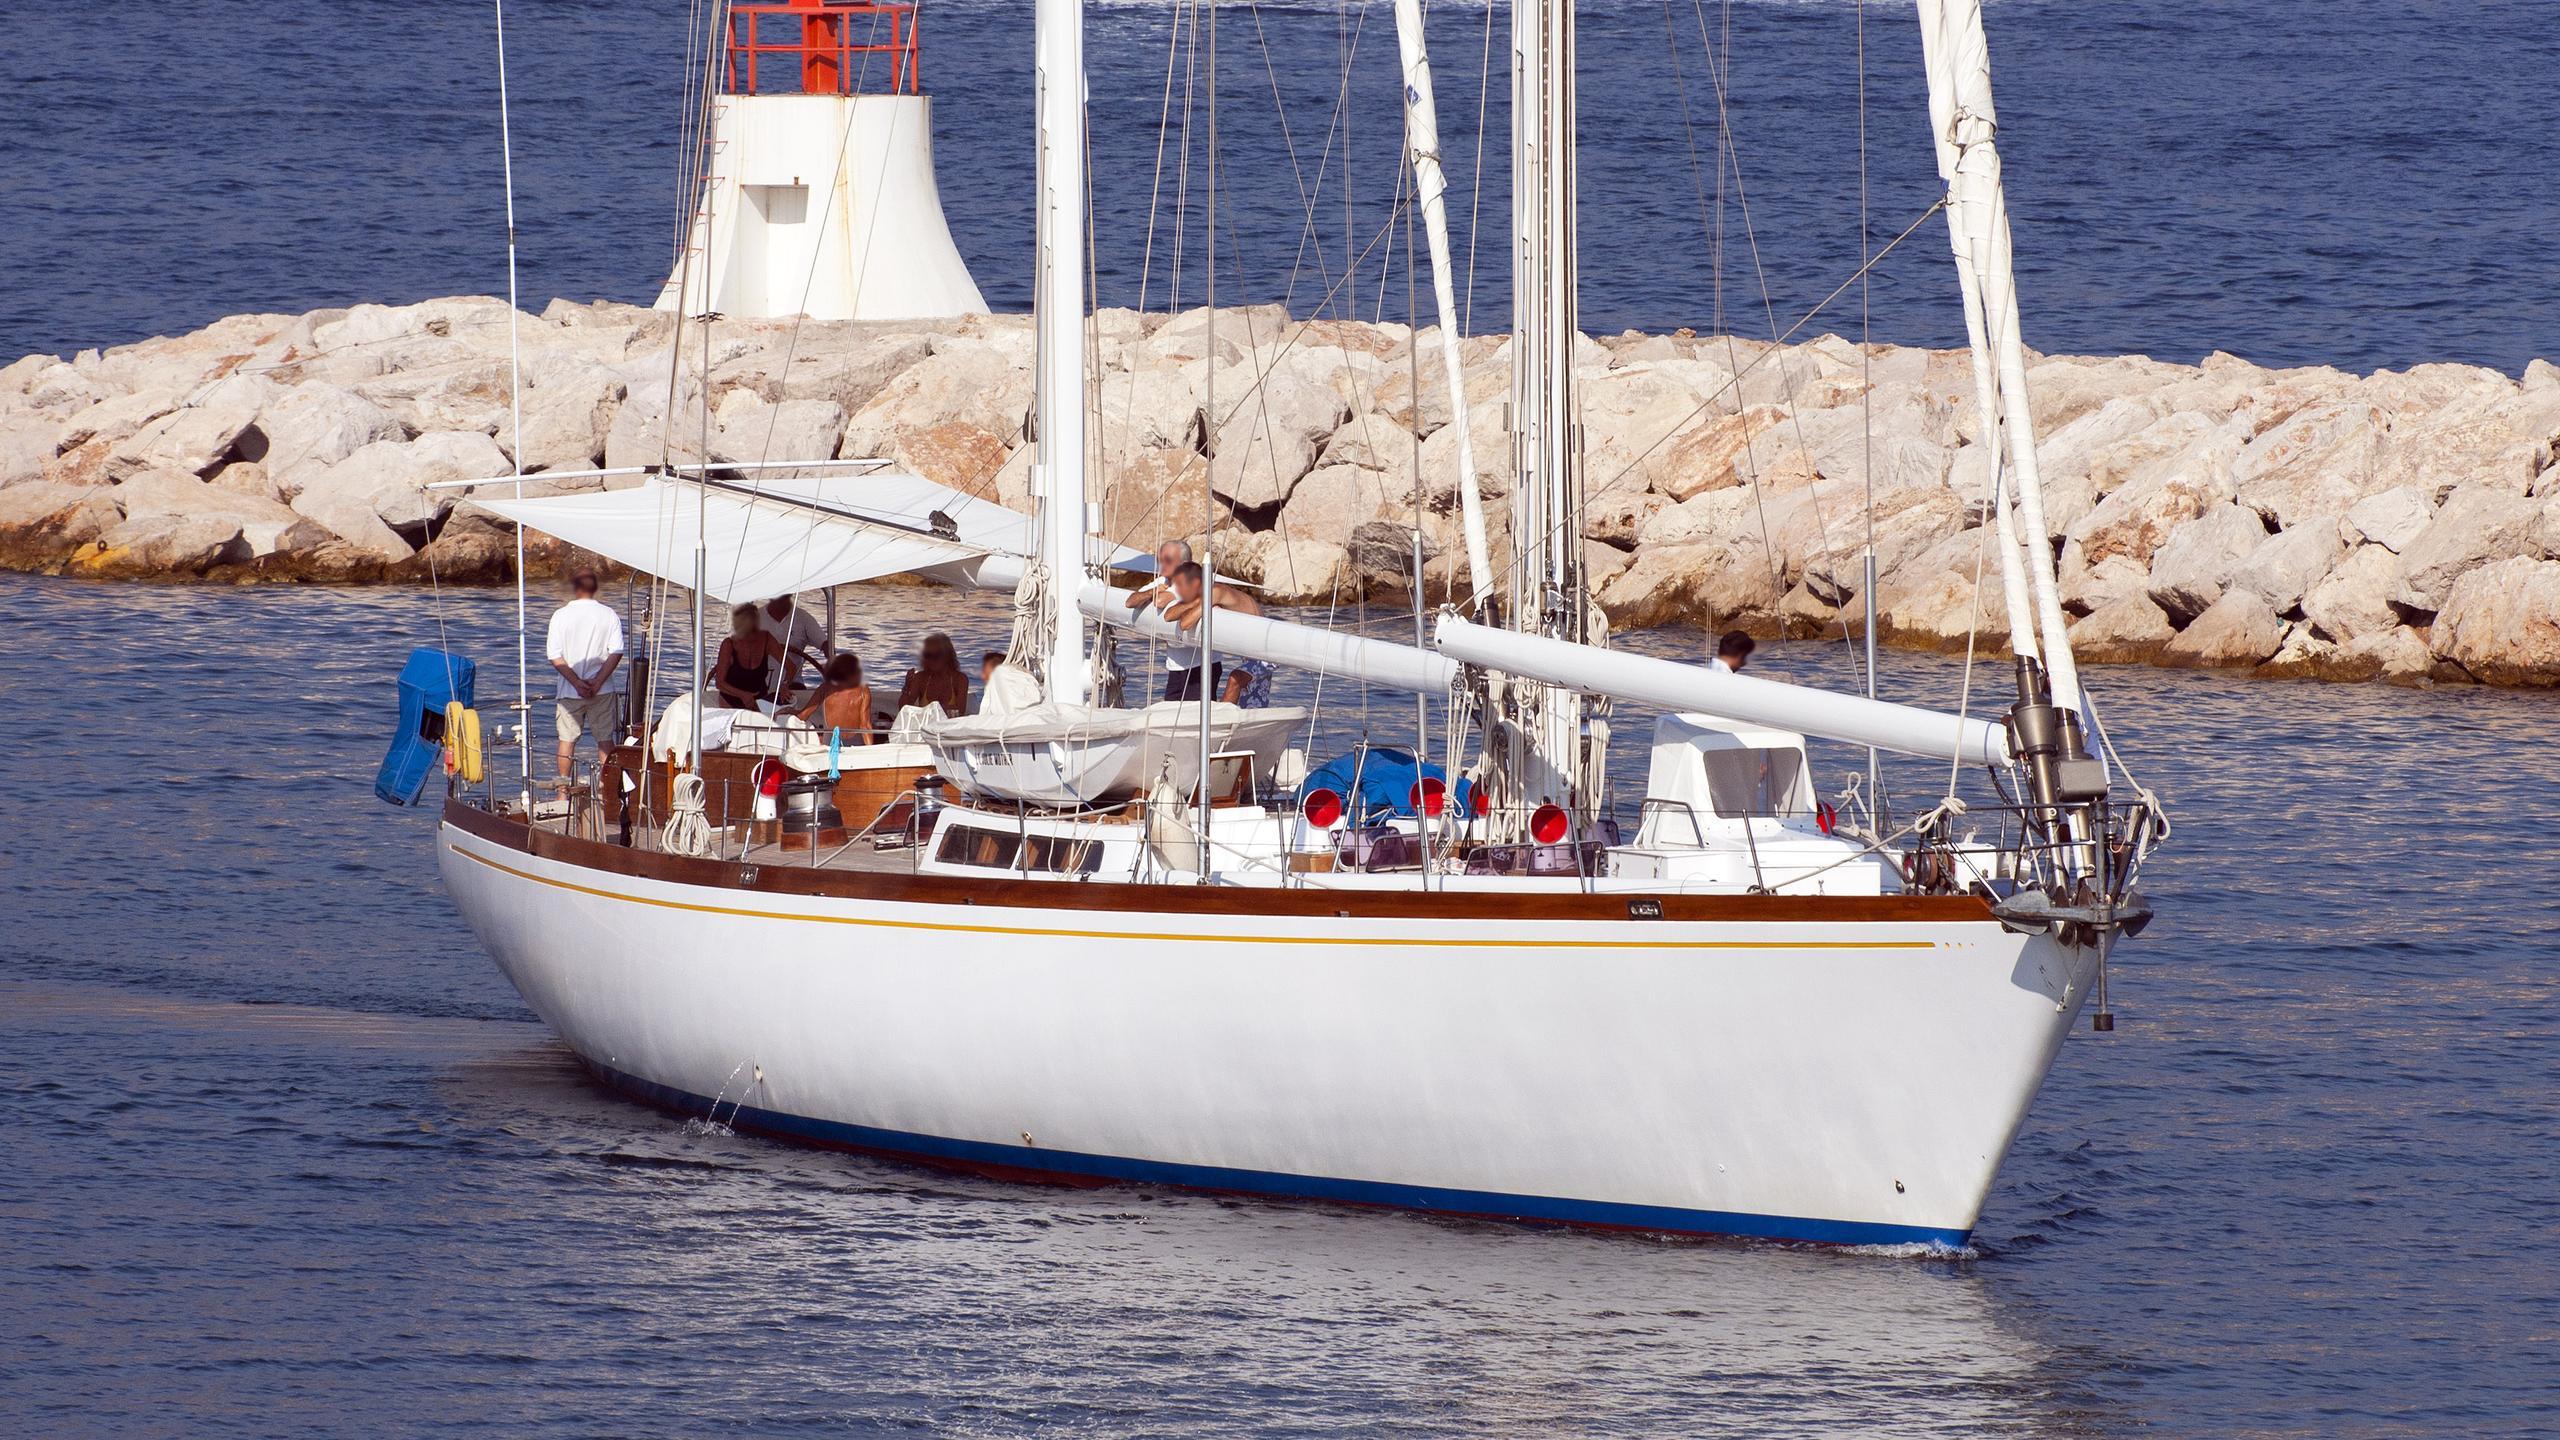 julie-mother-sailing-yacht-sangermani-1978-30m-bow